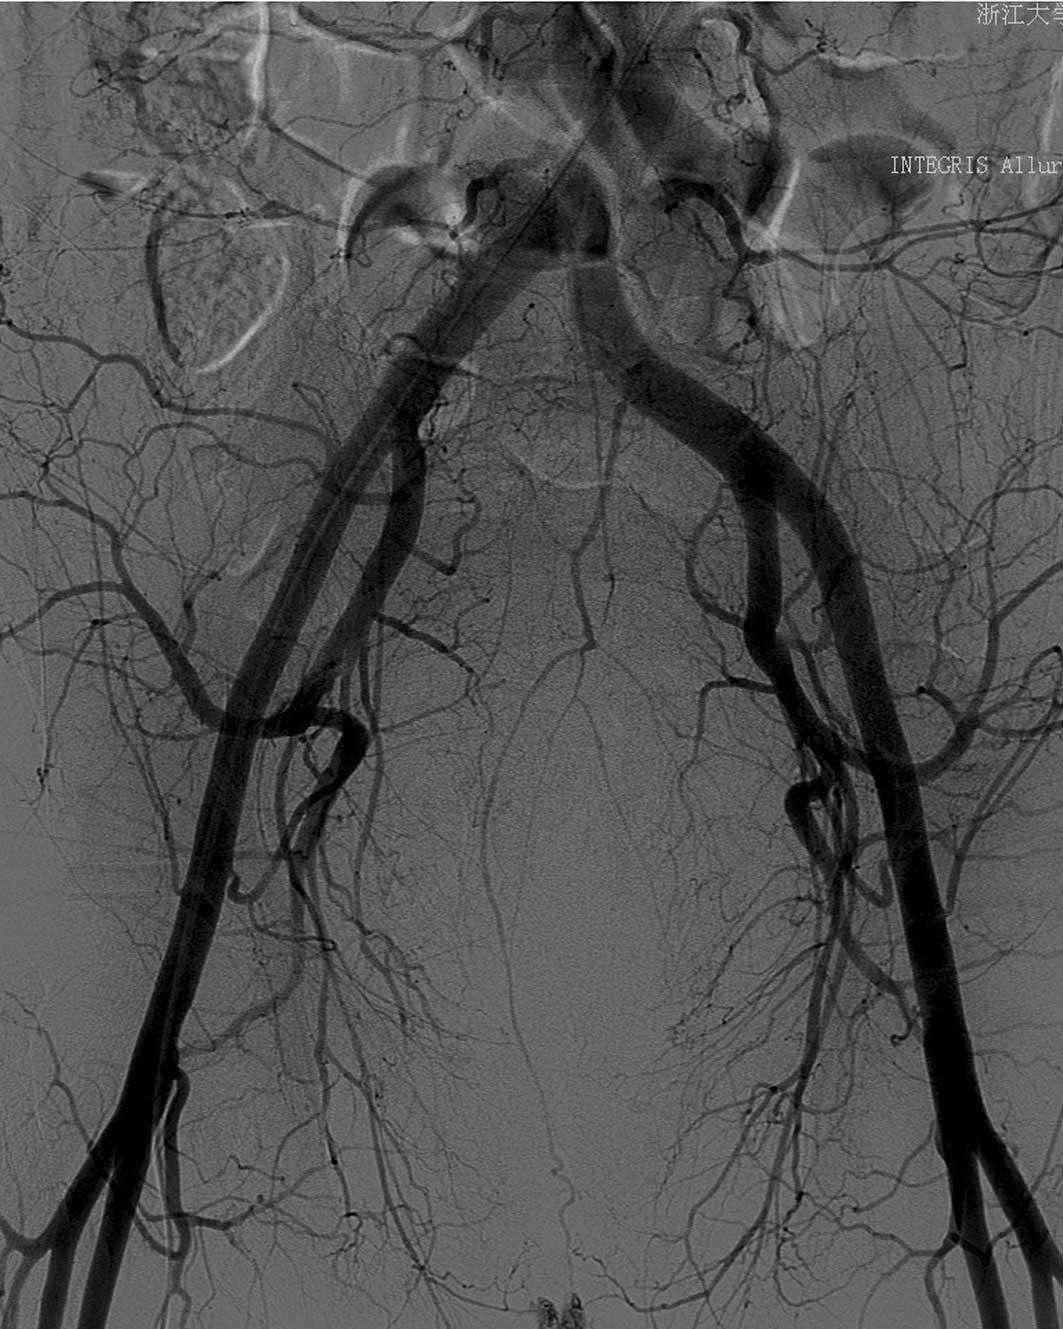 Superselective Internal Iliac Arterial Embolization For Severe